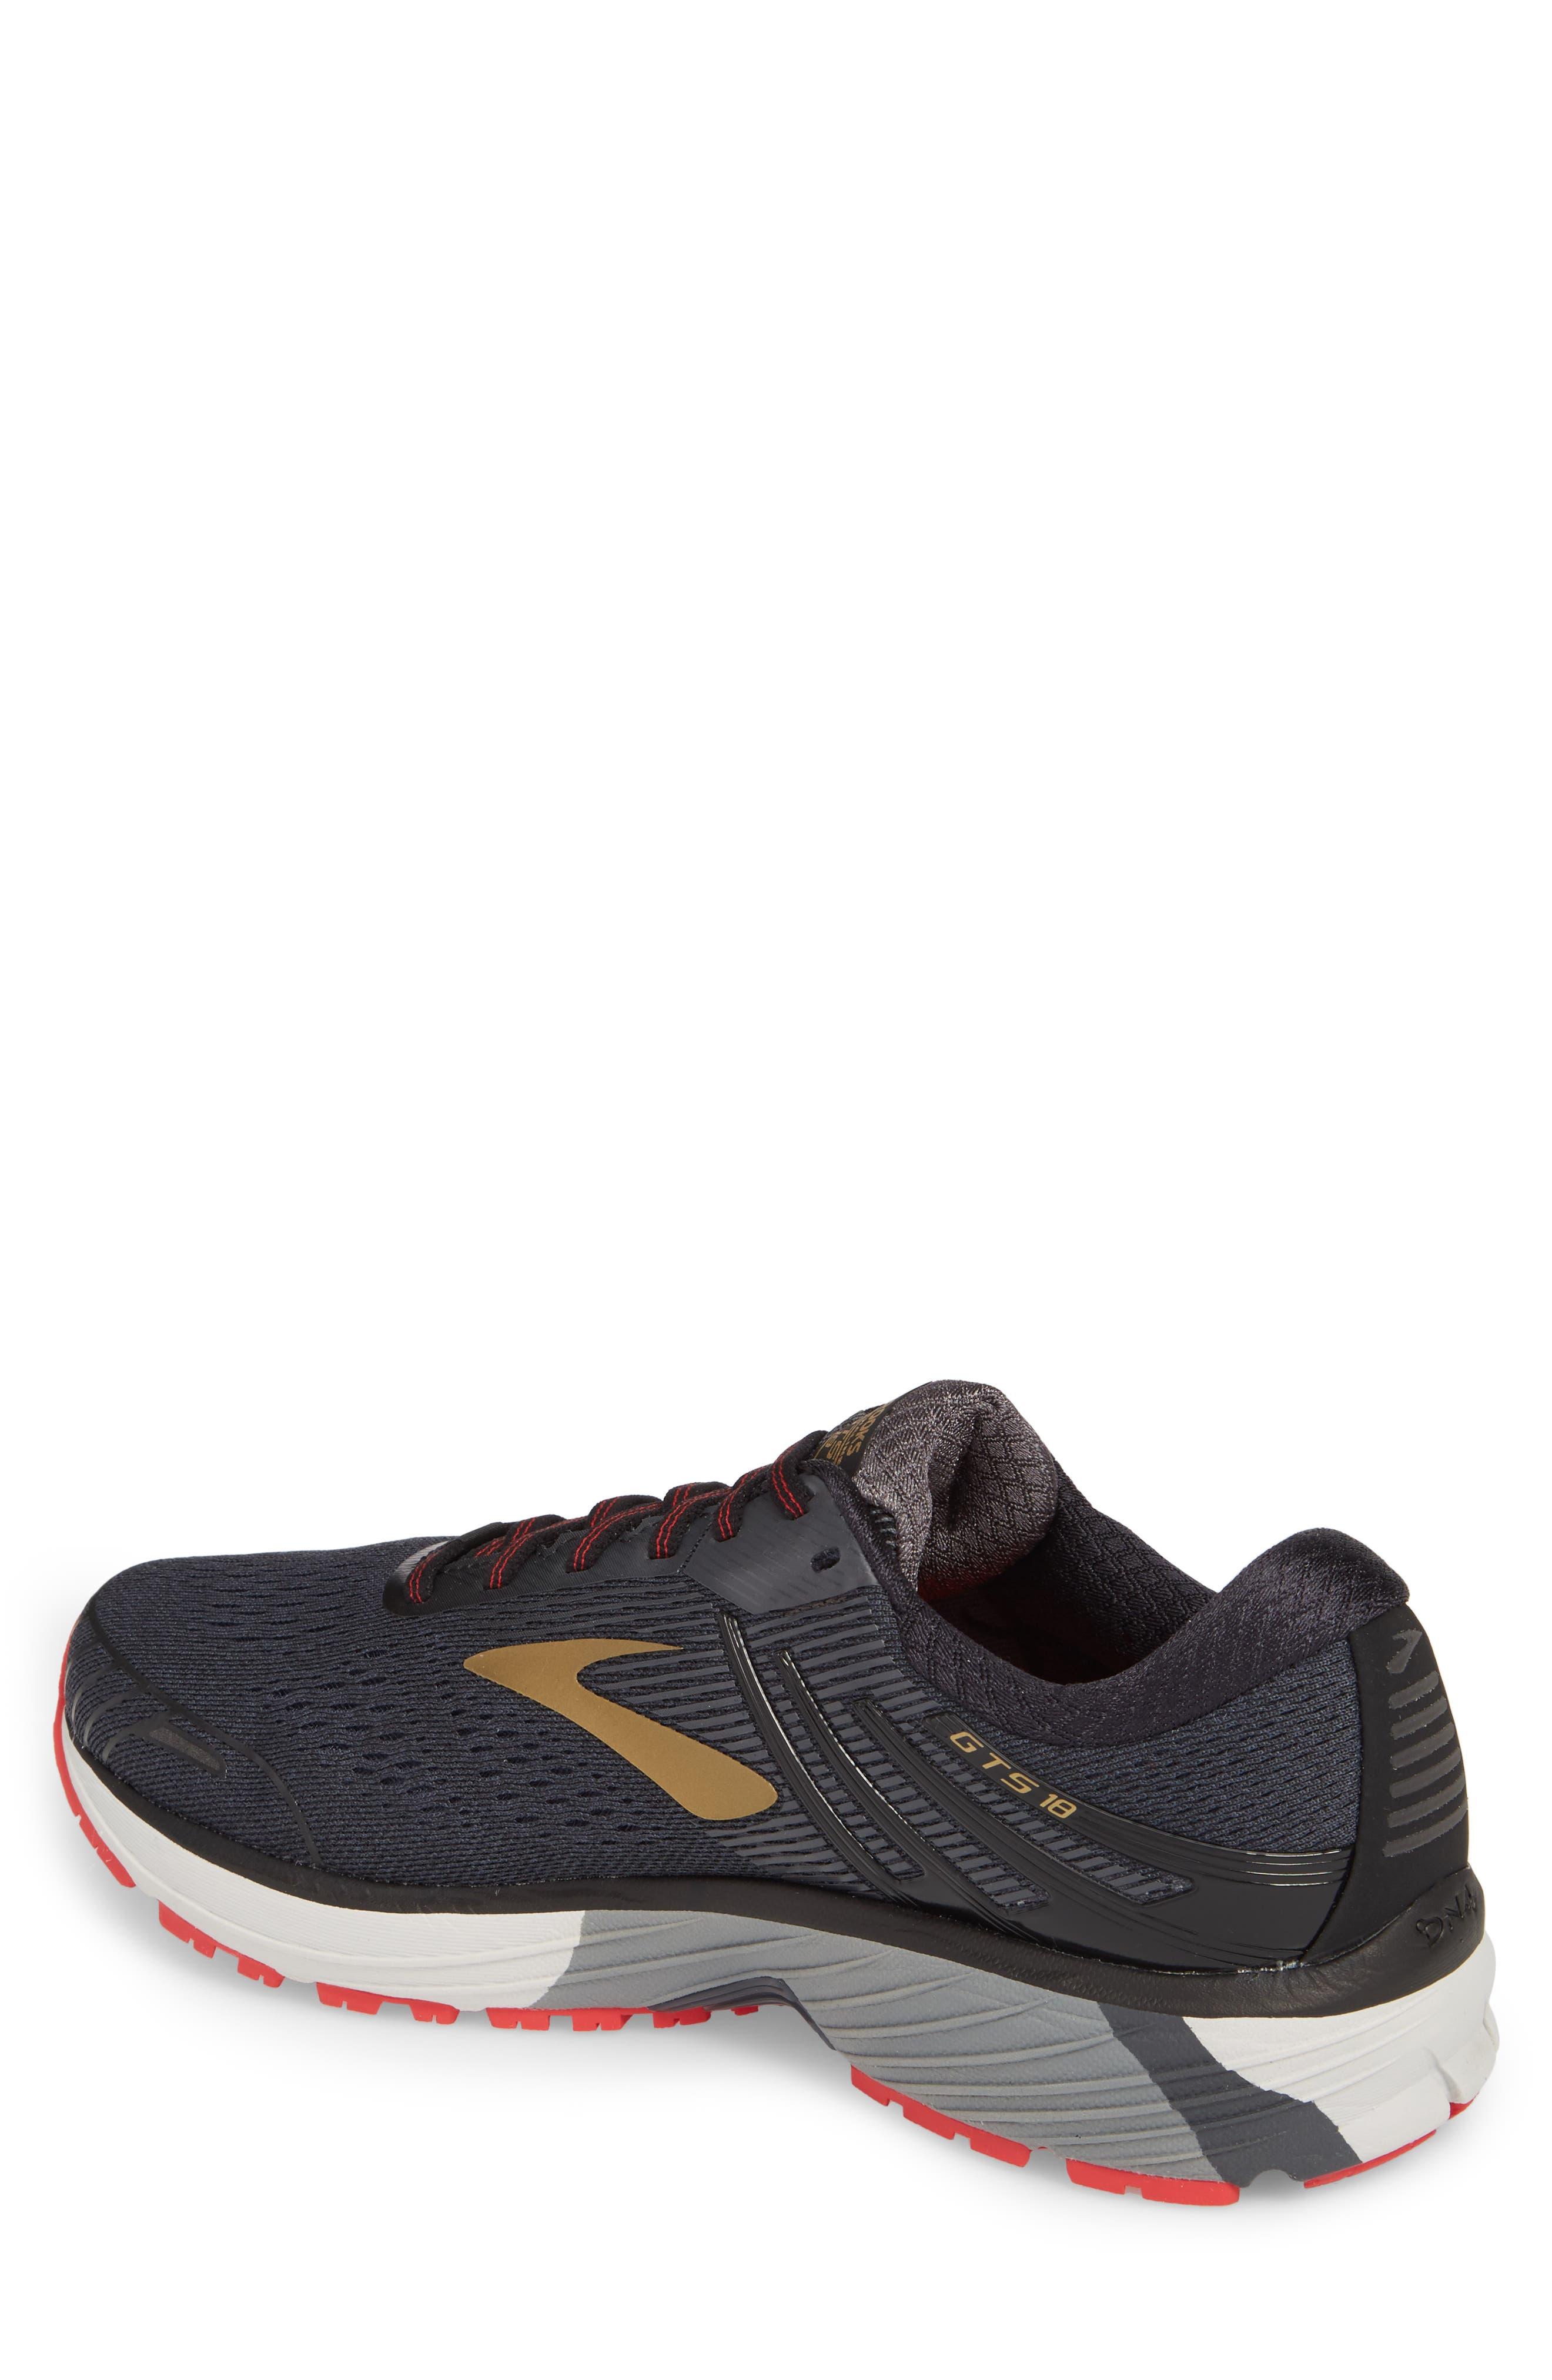 Adrenaline GTS 18 Running Shoe,                             Alternate thumbnail 2, color,                             BLACK/ GOLD/ RED